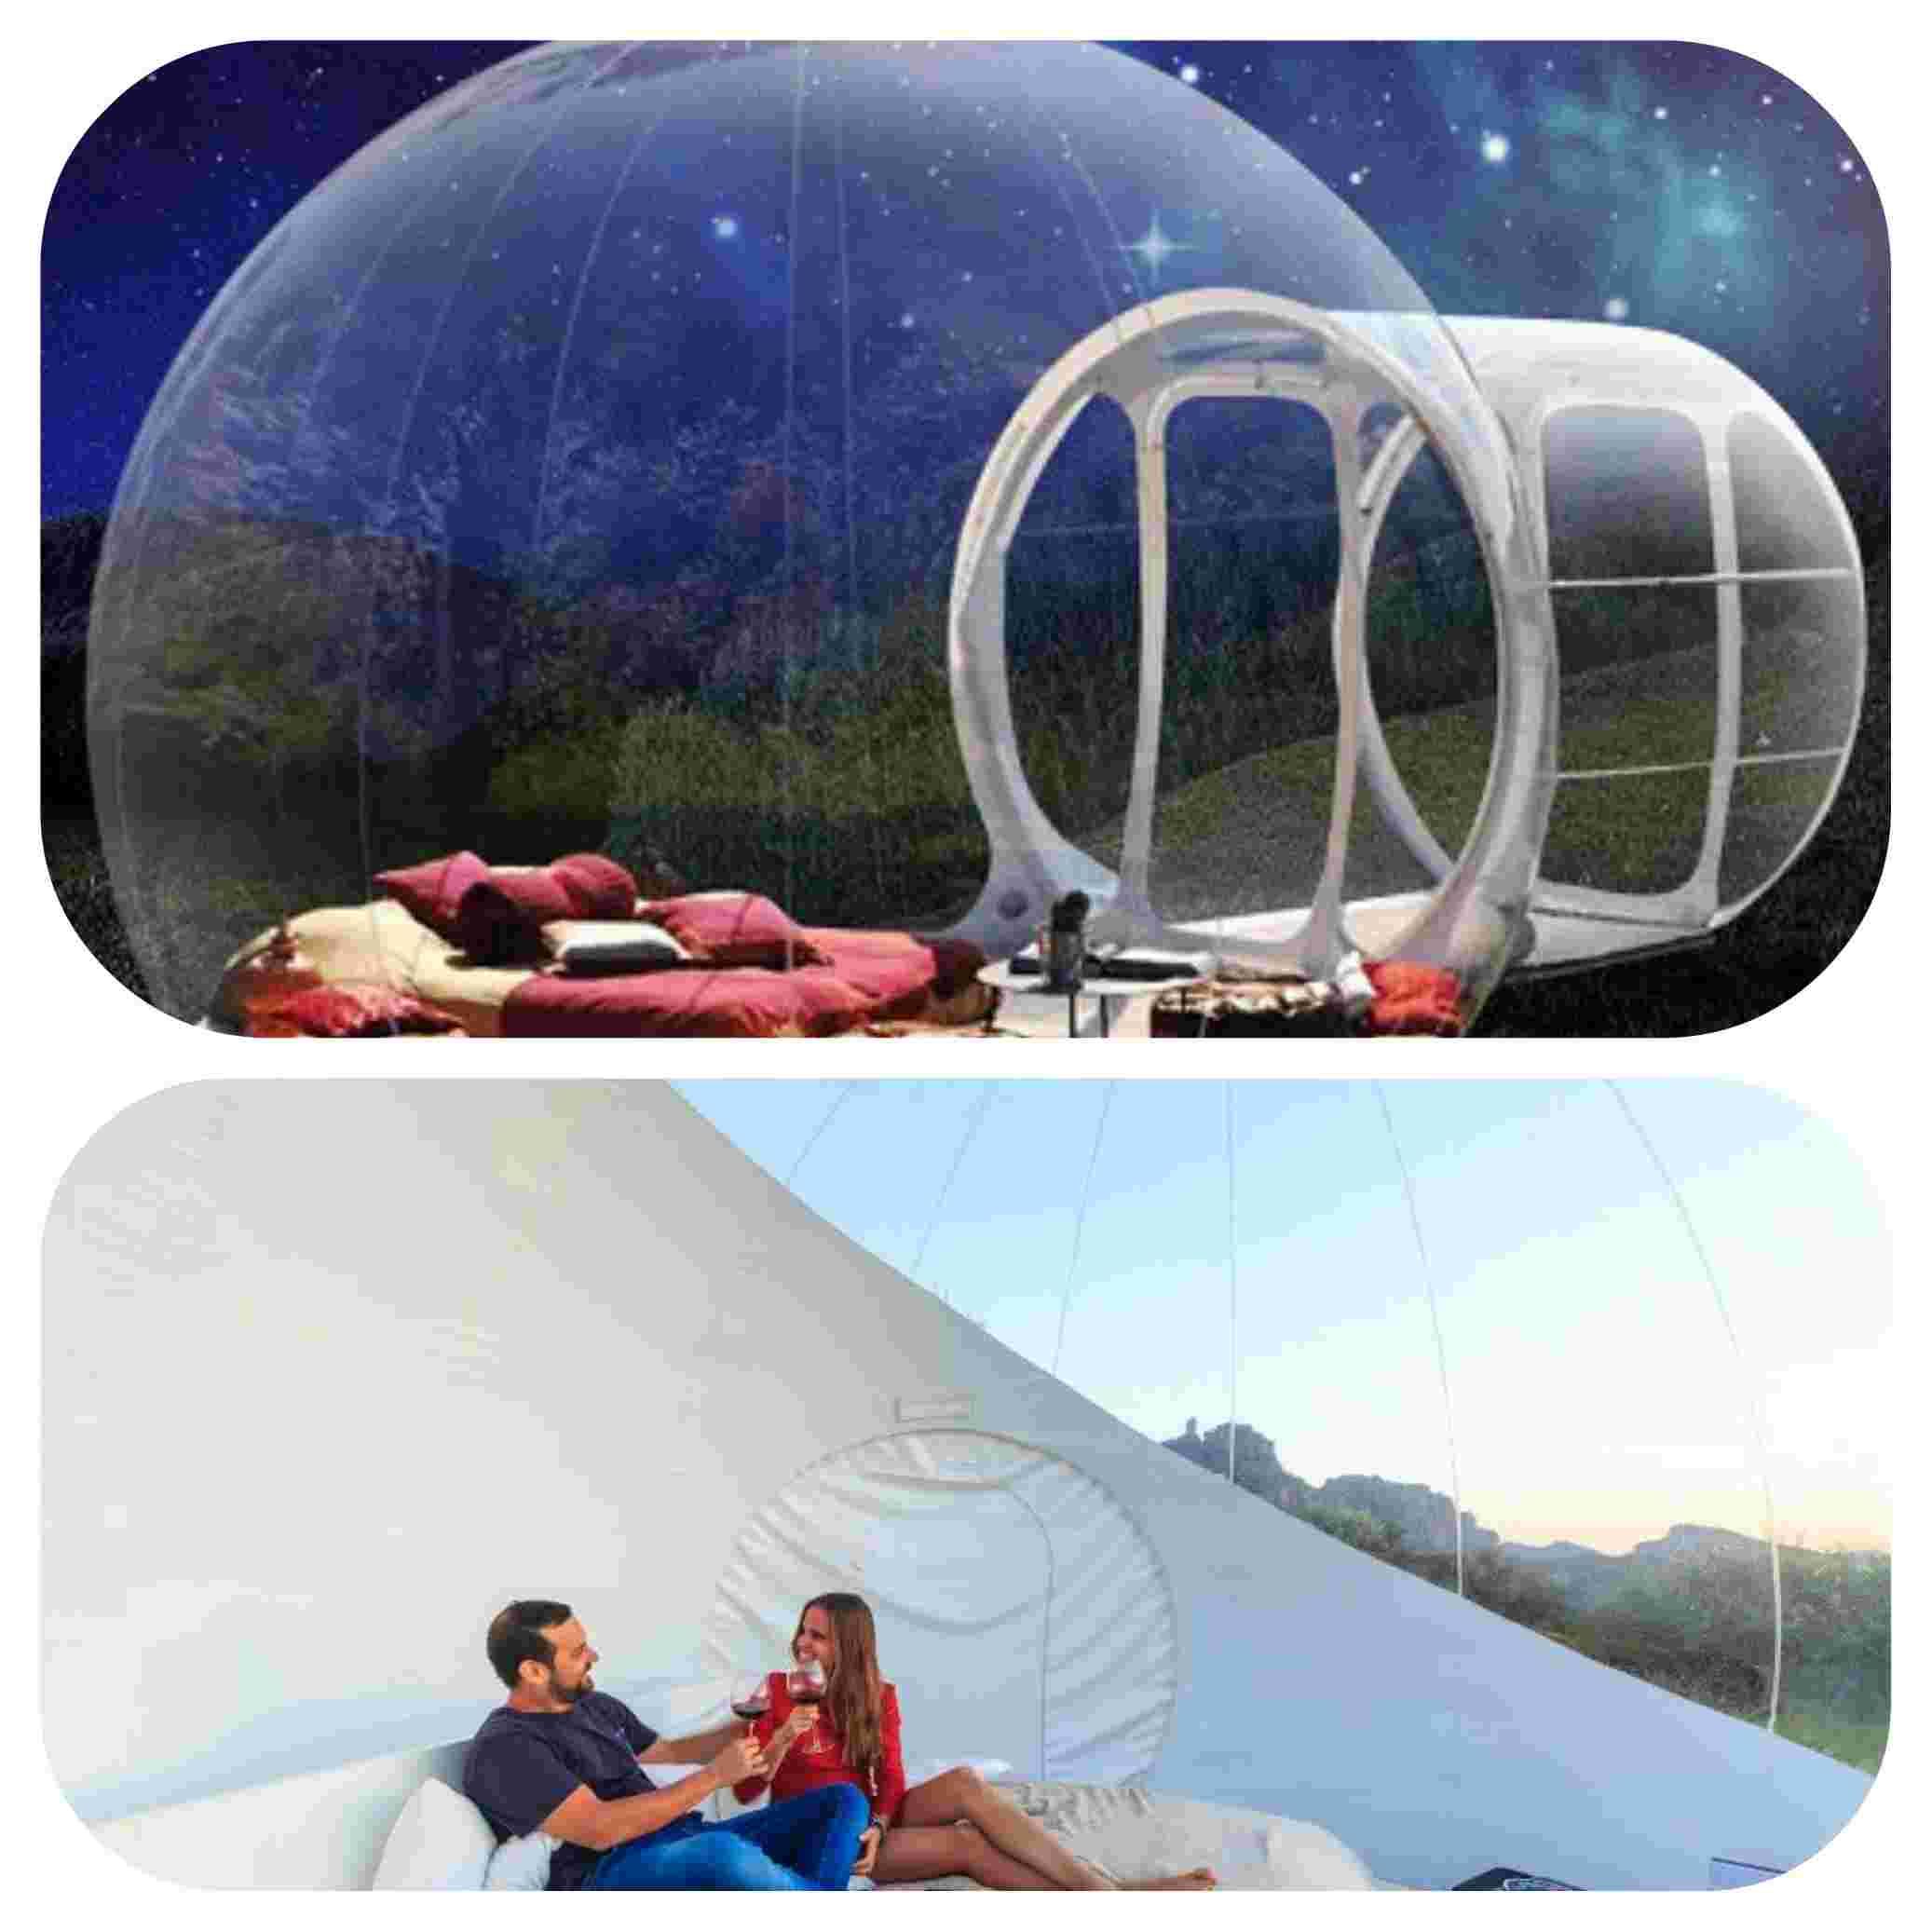 burbuja-hinchable-transparente-tienda-glamping